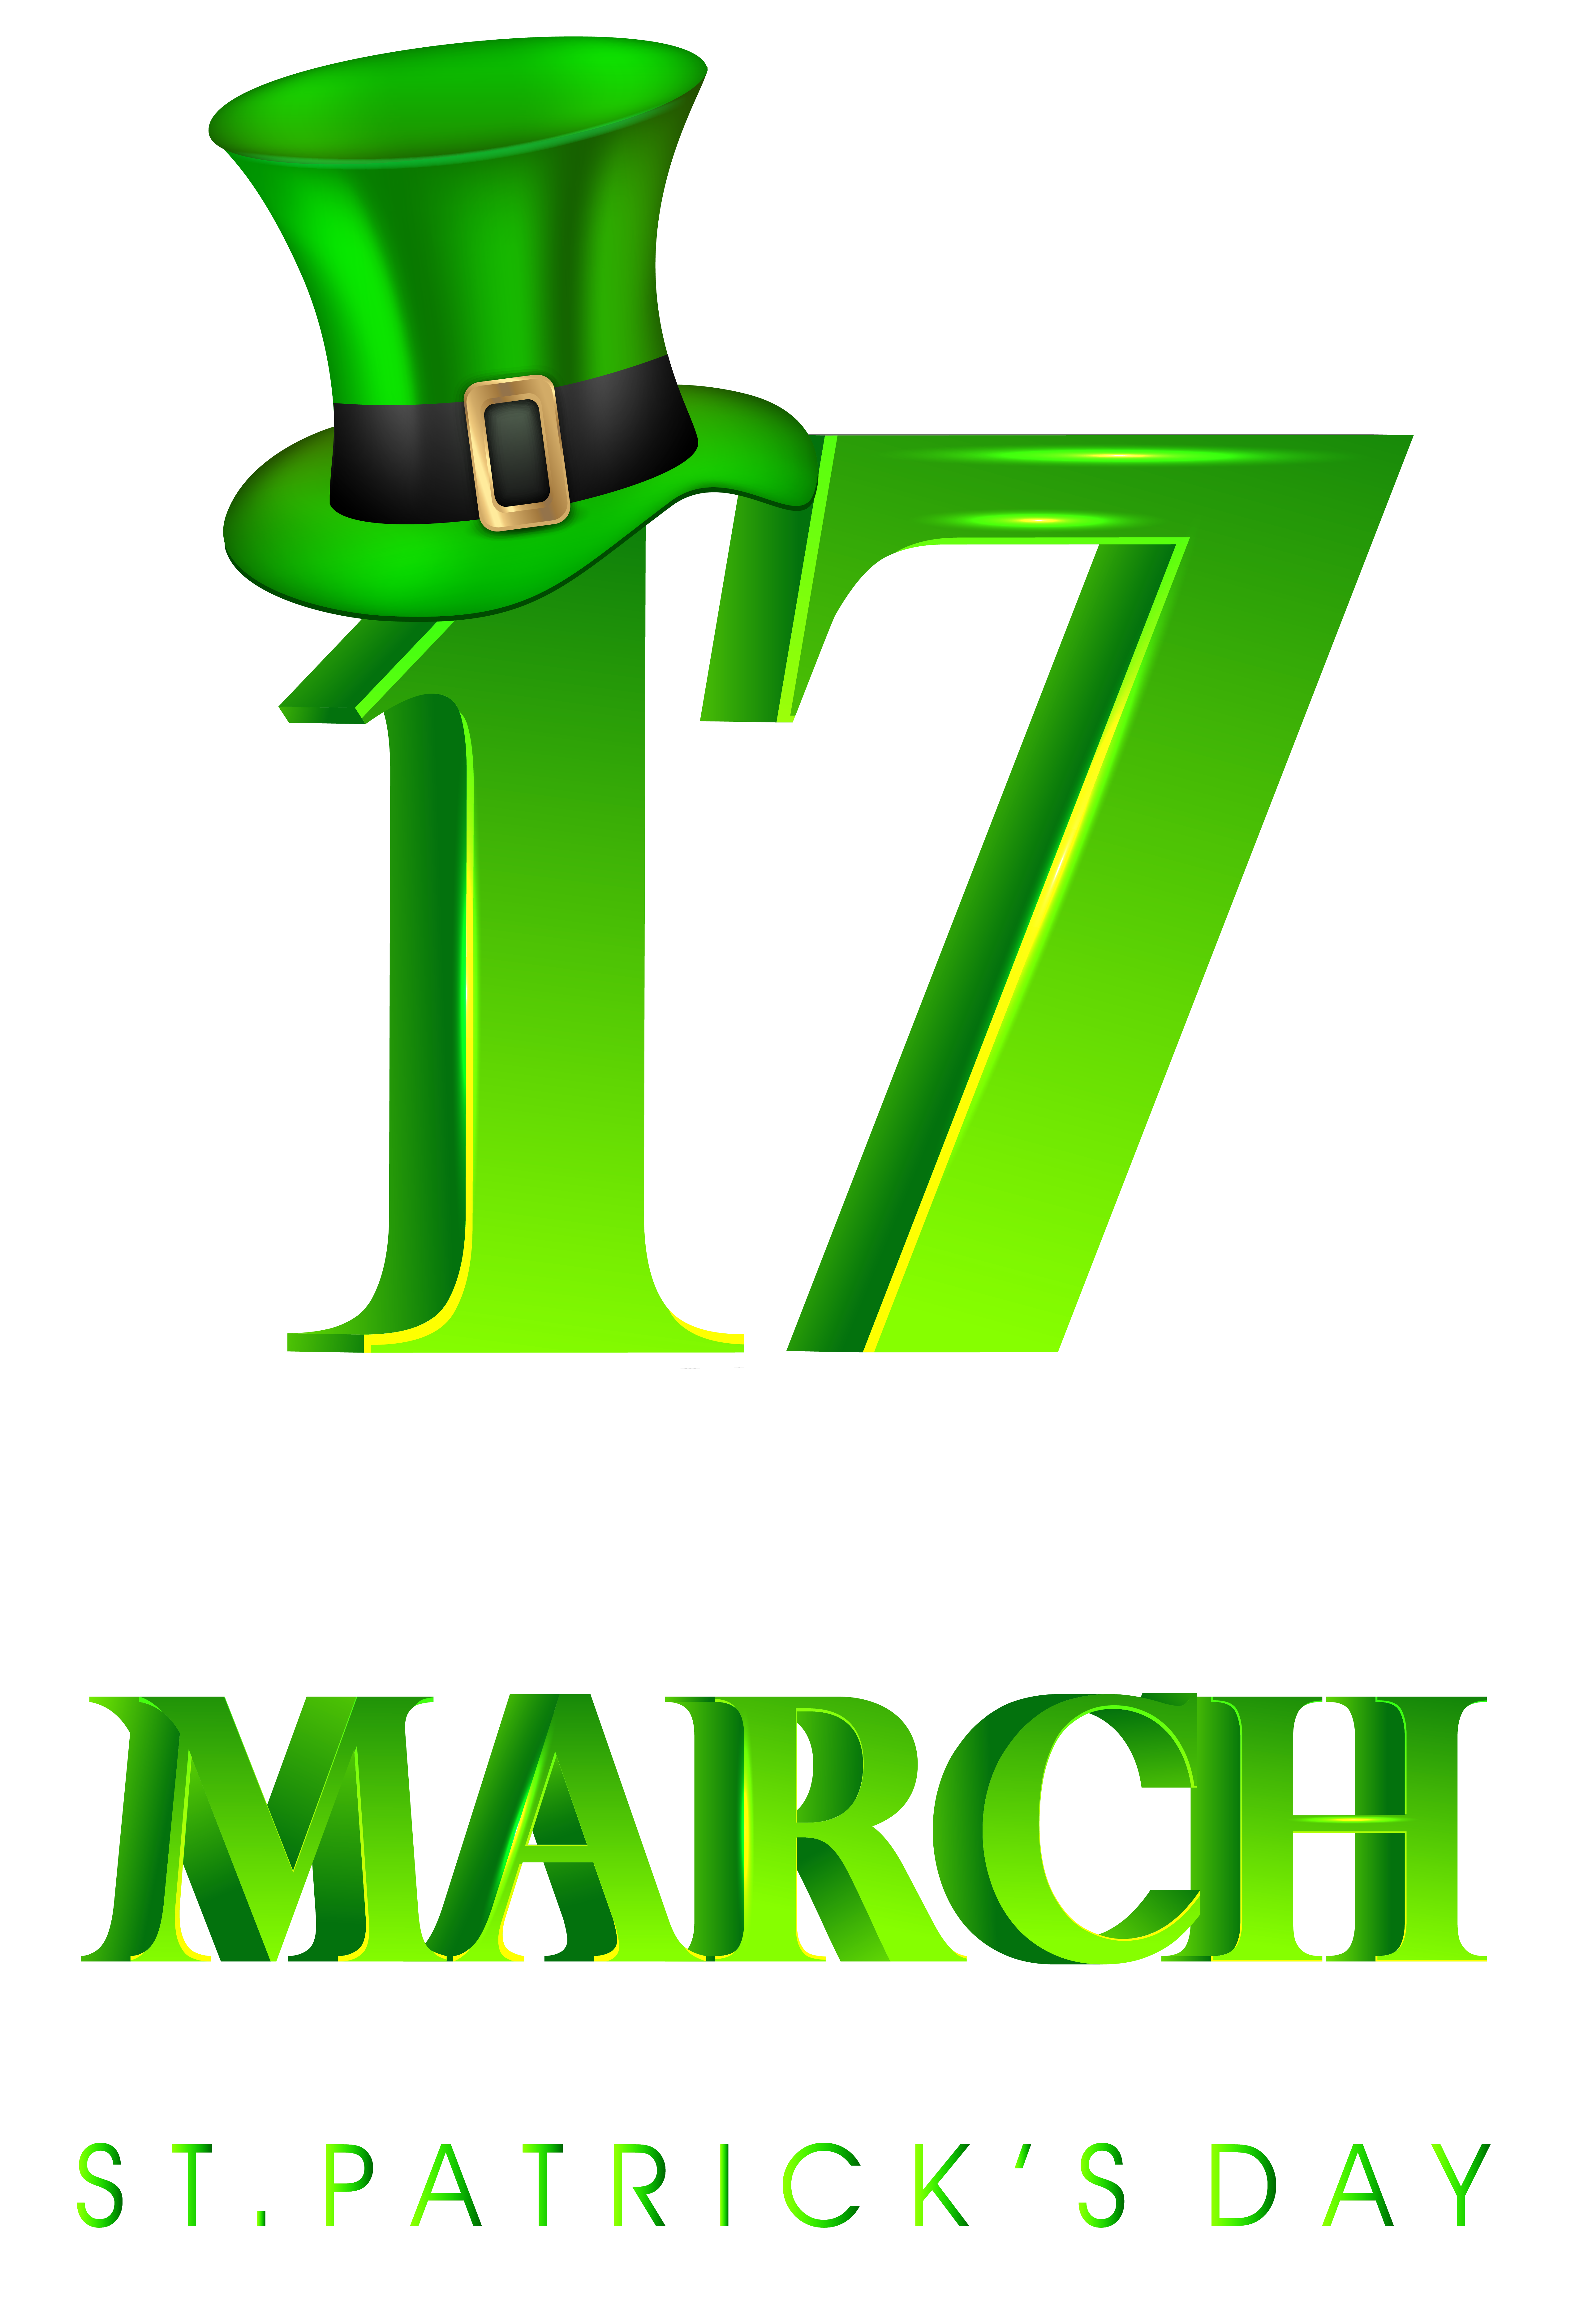 17 March St Patricks Day Transparent Png Clip Art Image